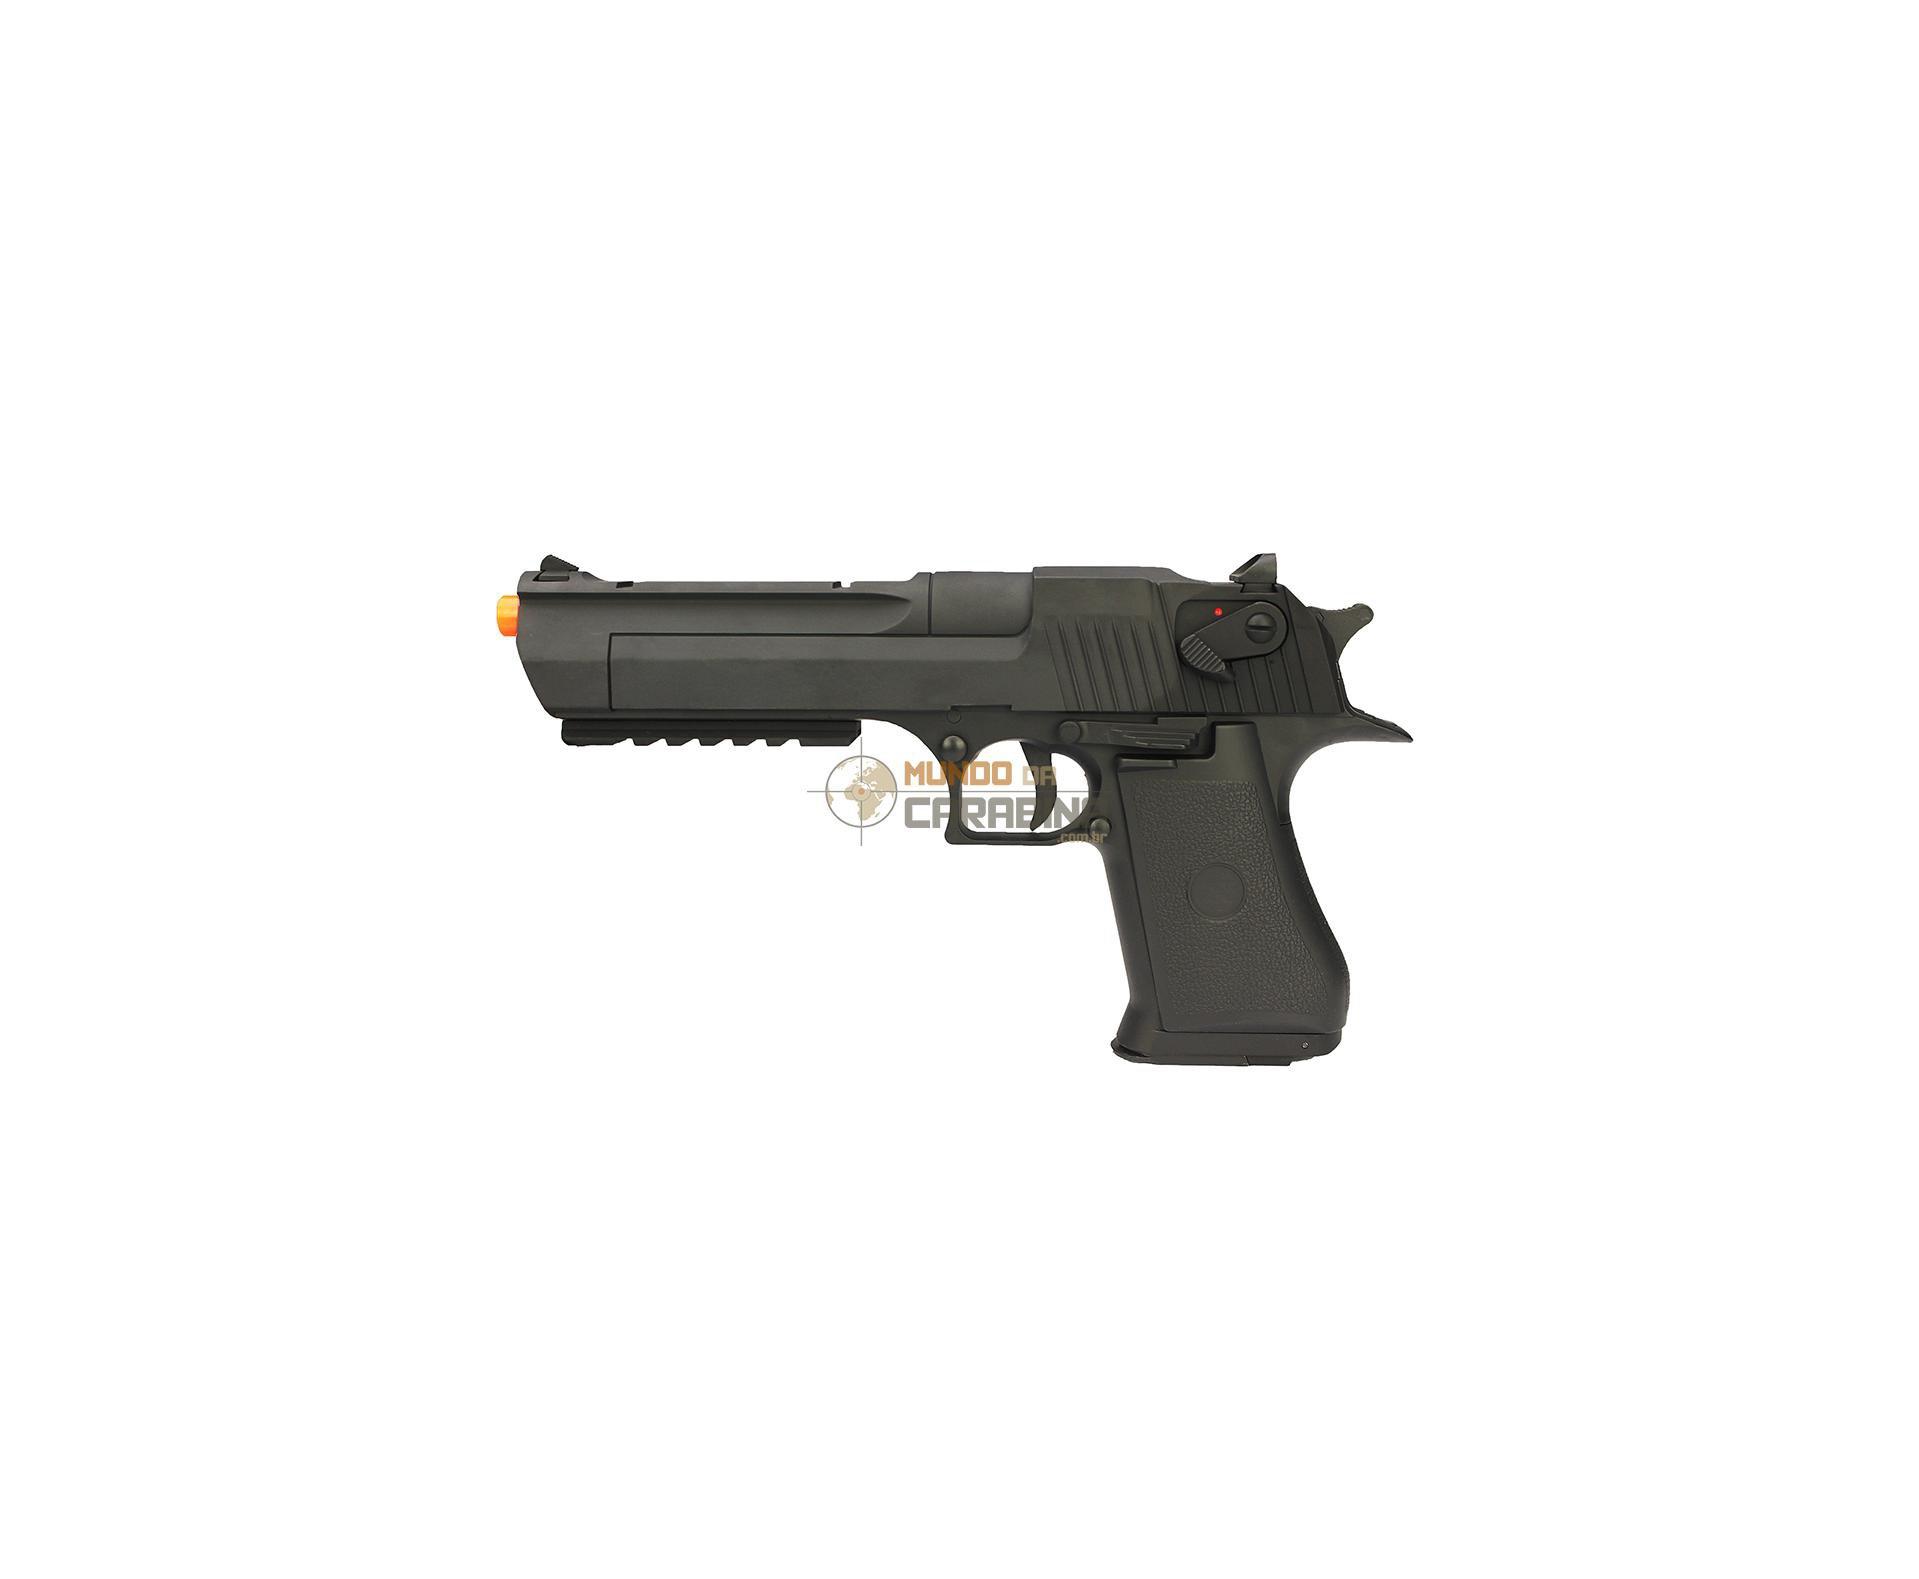 Pistola De Airsoft Desert Eagle .50 - Full Metal Elétrica- Calibre 6,0 Mm - Cyma  Cm 121 - Bivolt